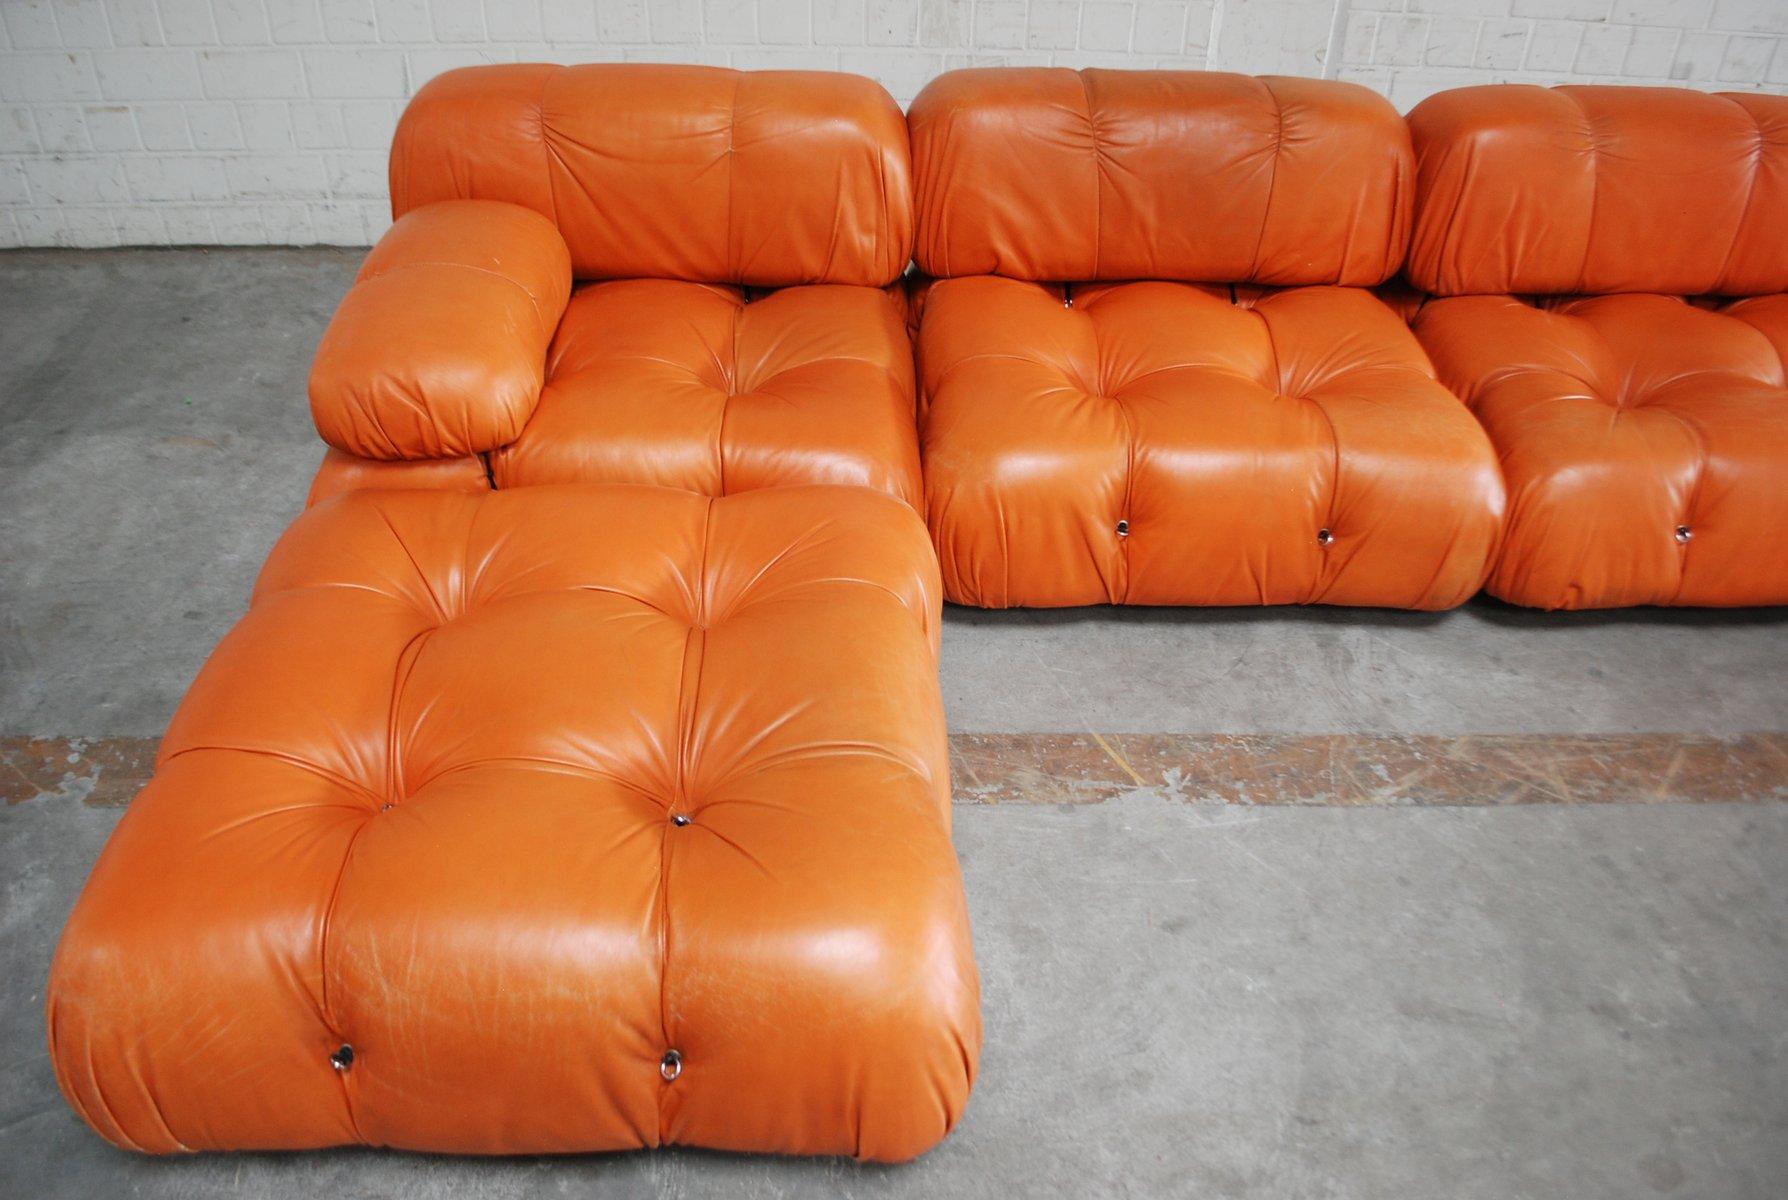 canap modulable camaleonda en cuir par mario bellini pour c b italia 1960s en vente sur pamono. Black Bedroom Furniture Sets. Home Design Ideas